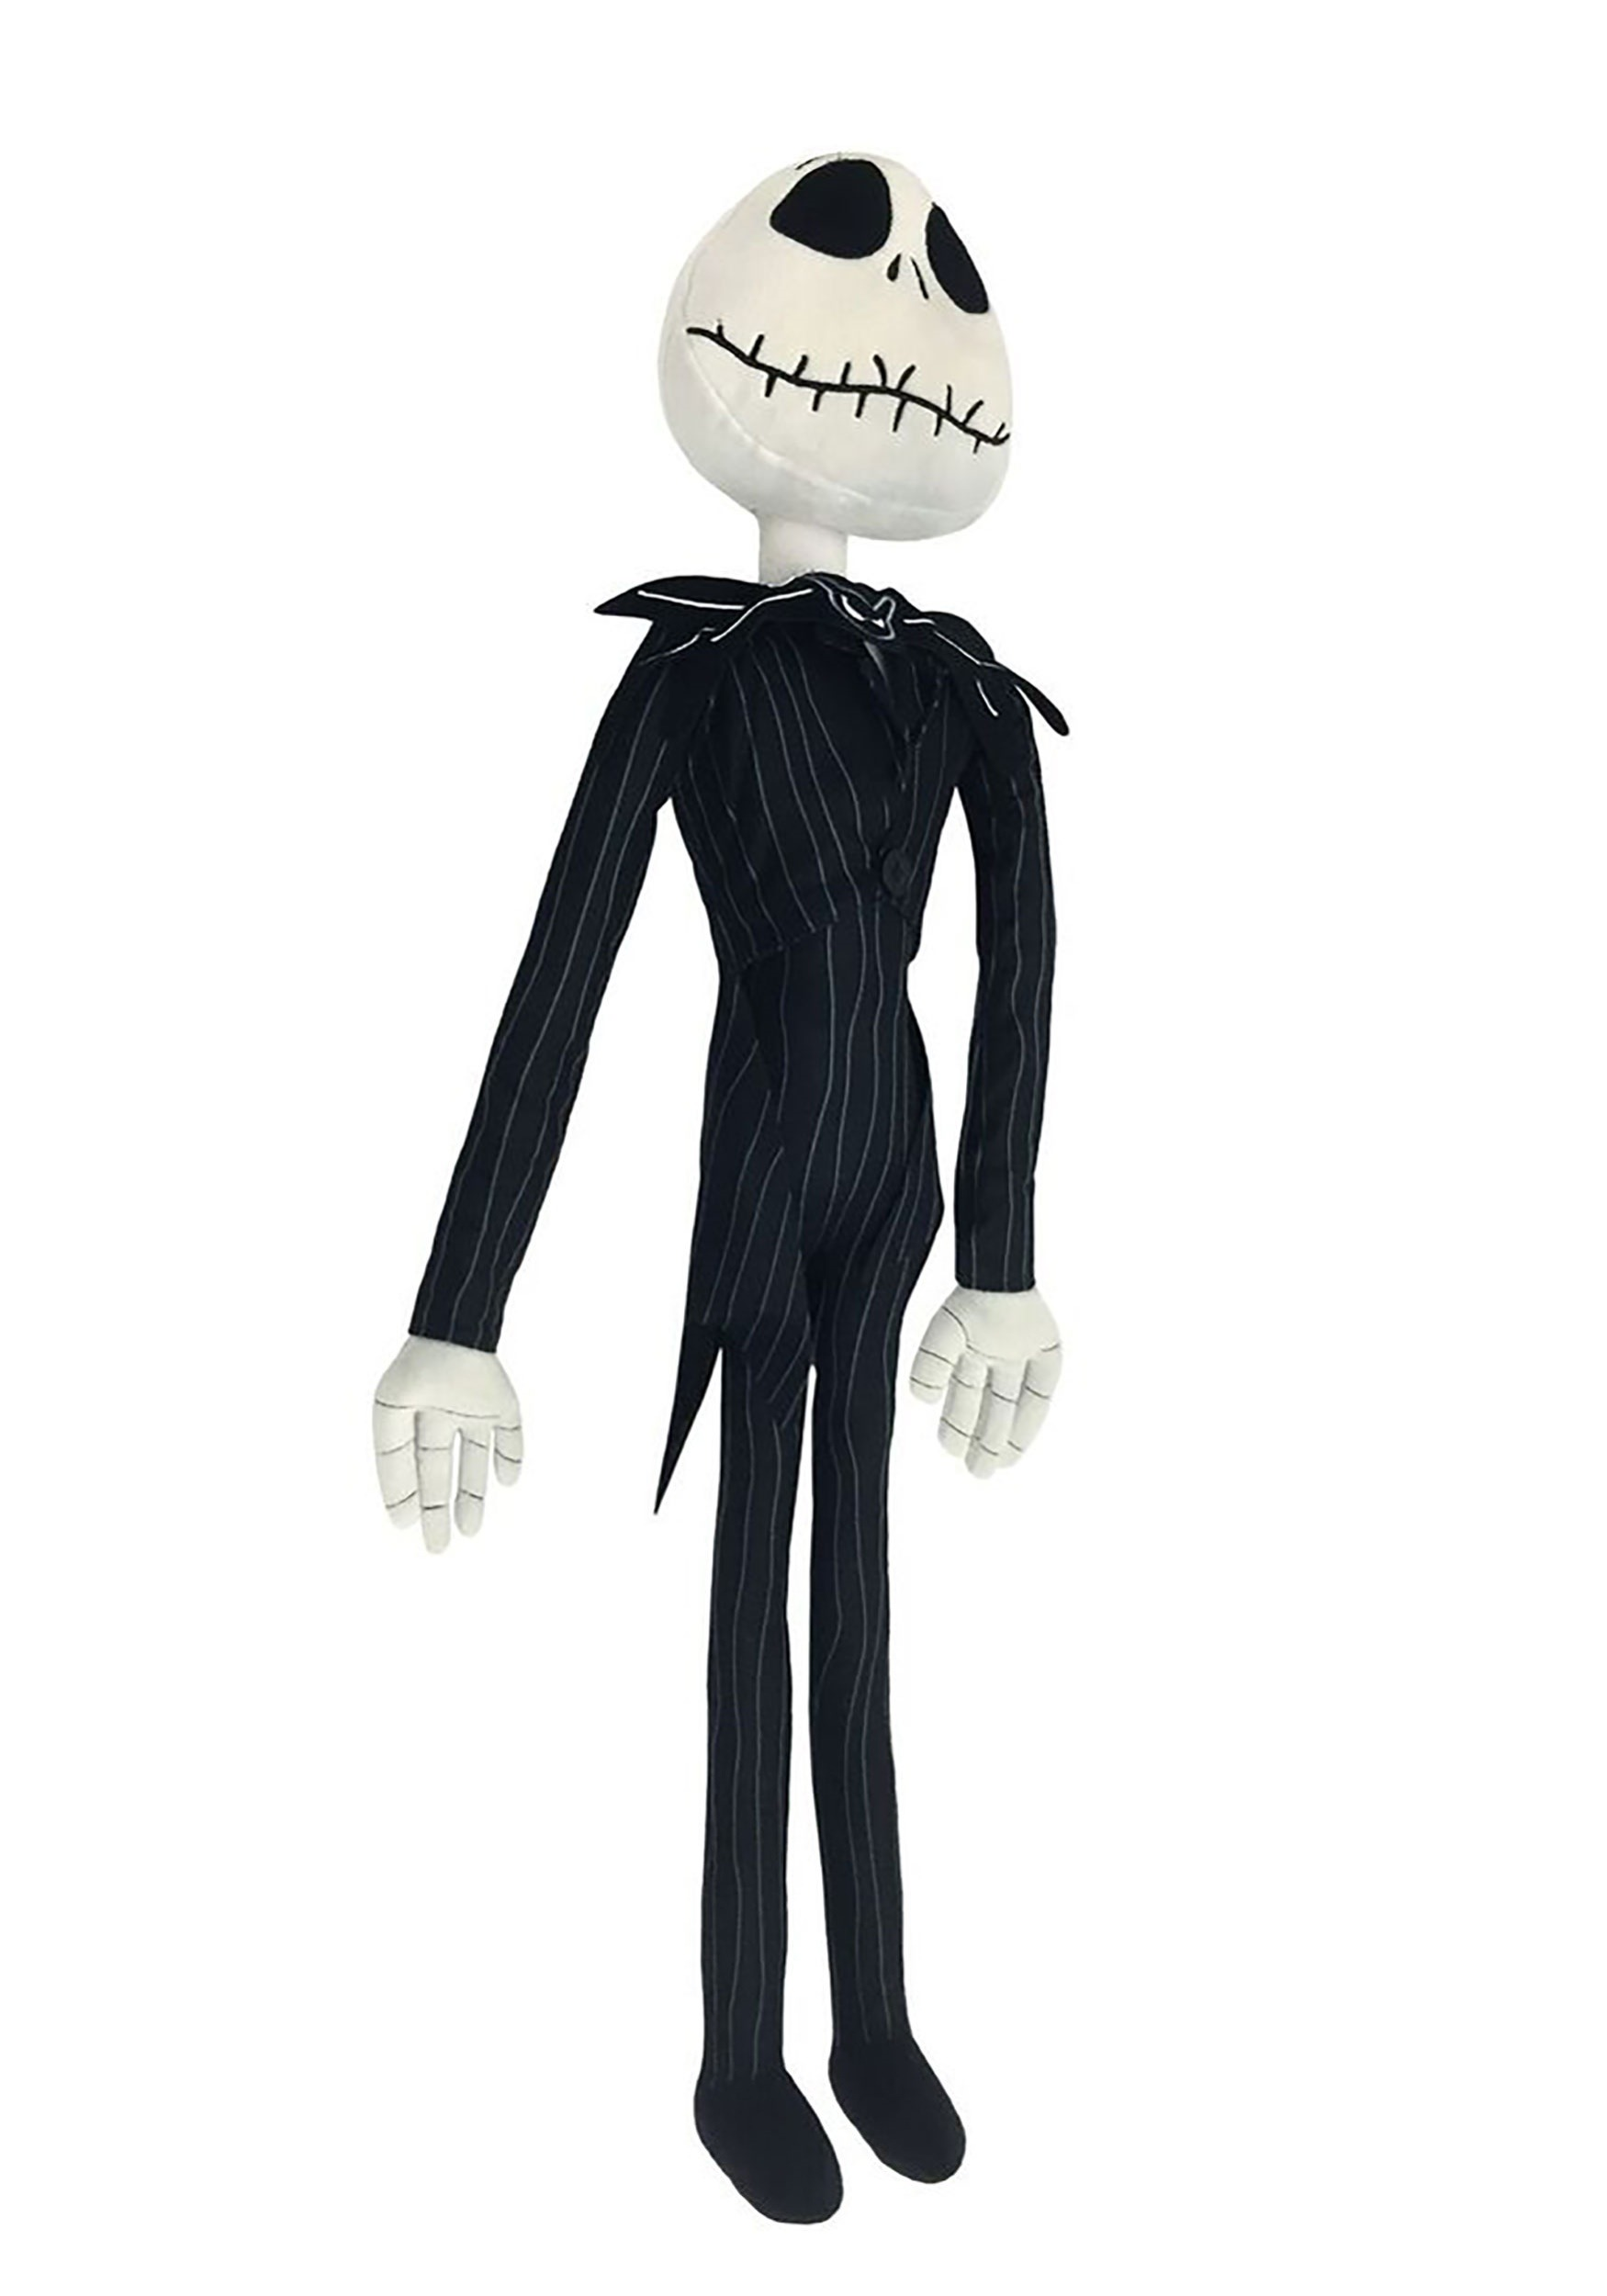 Nightmare Before Christmas Jack Skellington Plush Doll 0a4d6ab4e1